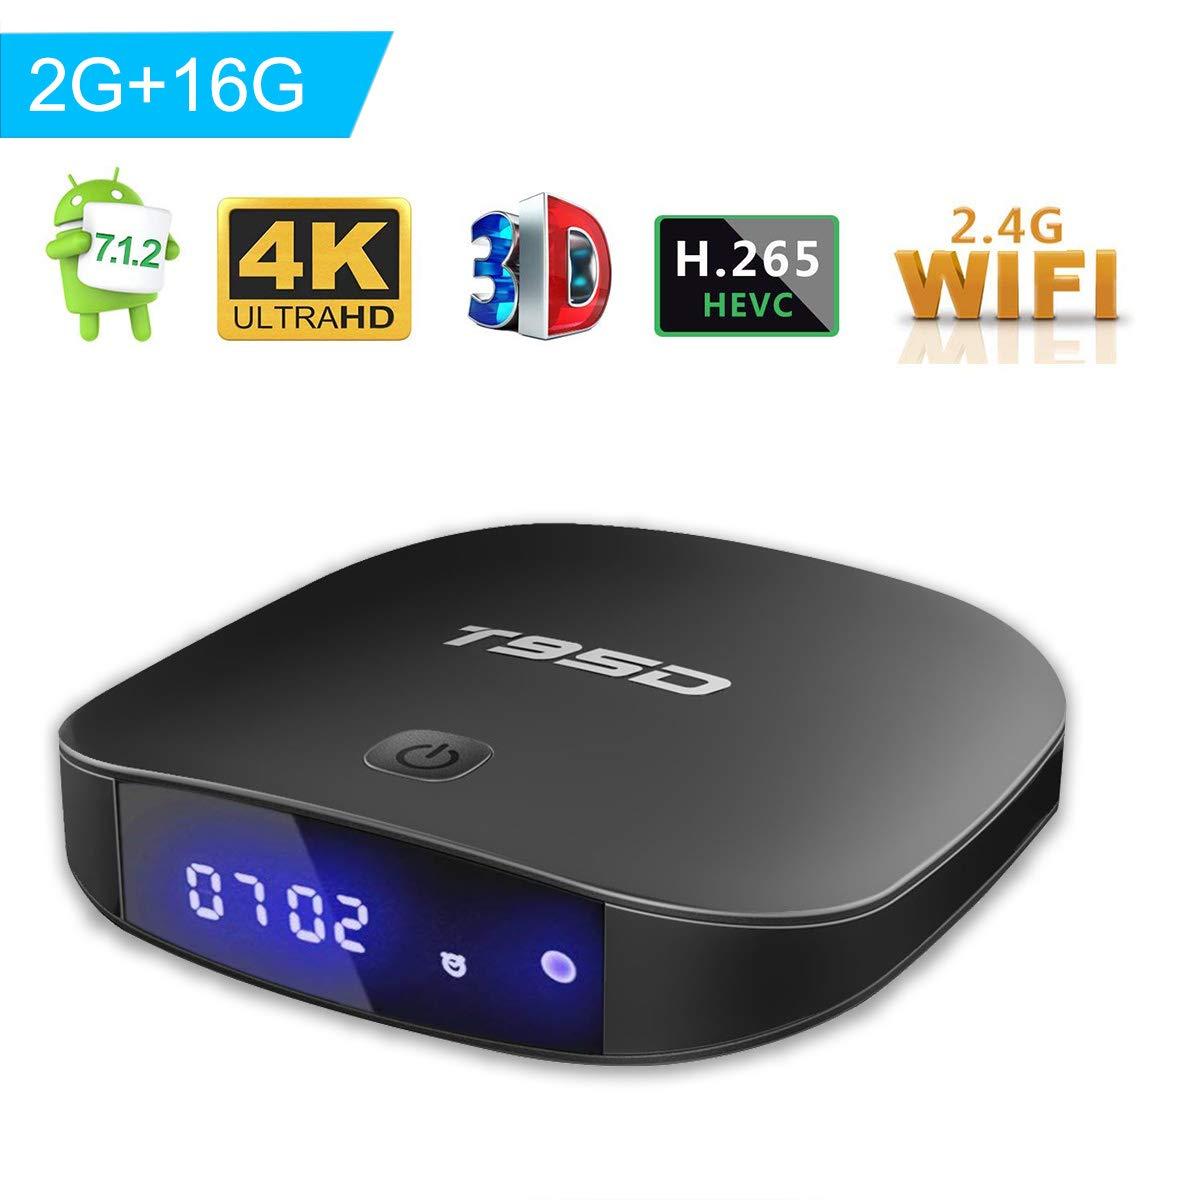 TRUEWELL T95D Android 7.1 tv box with 2GB RAM/16GB ROM Rockchip RK3229 Quad-core Support 2.4G Wifi 3D 4K Ultra HD BlueTooth improved version CJW